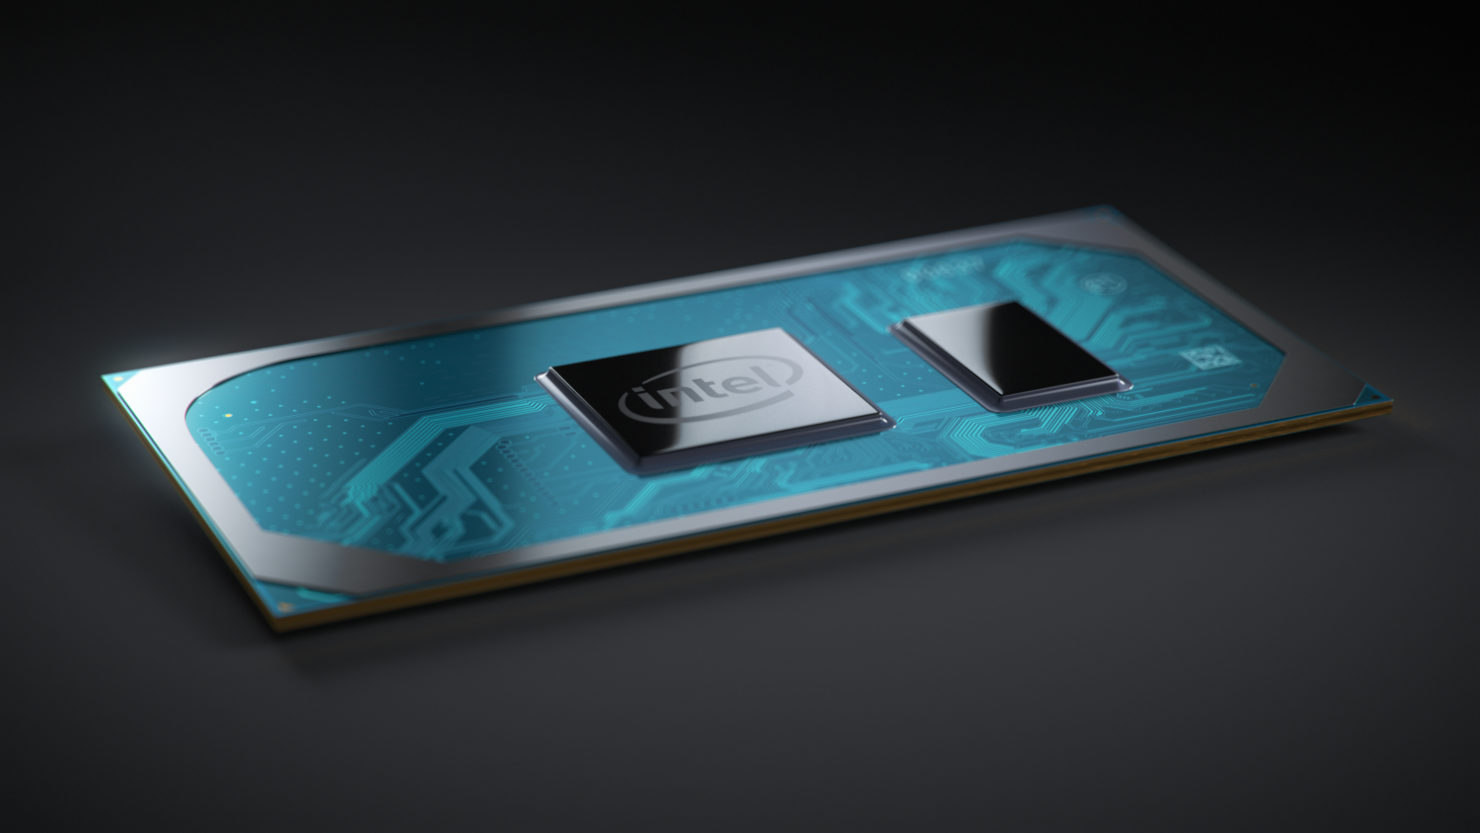 https://www.coolaler.com.tw/image/news/20/07/Intel-10nm.jpg